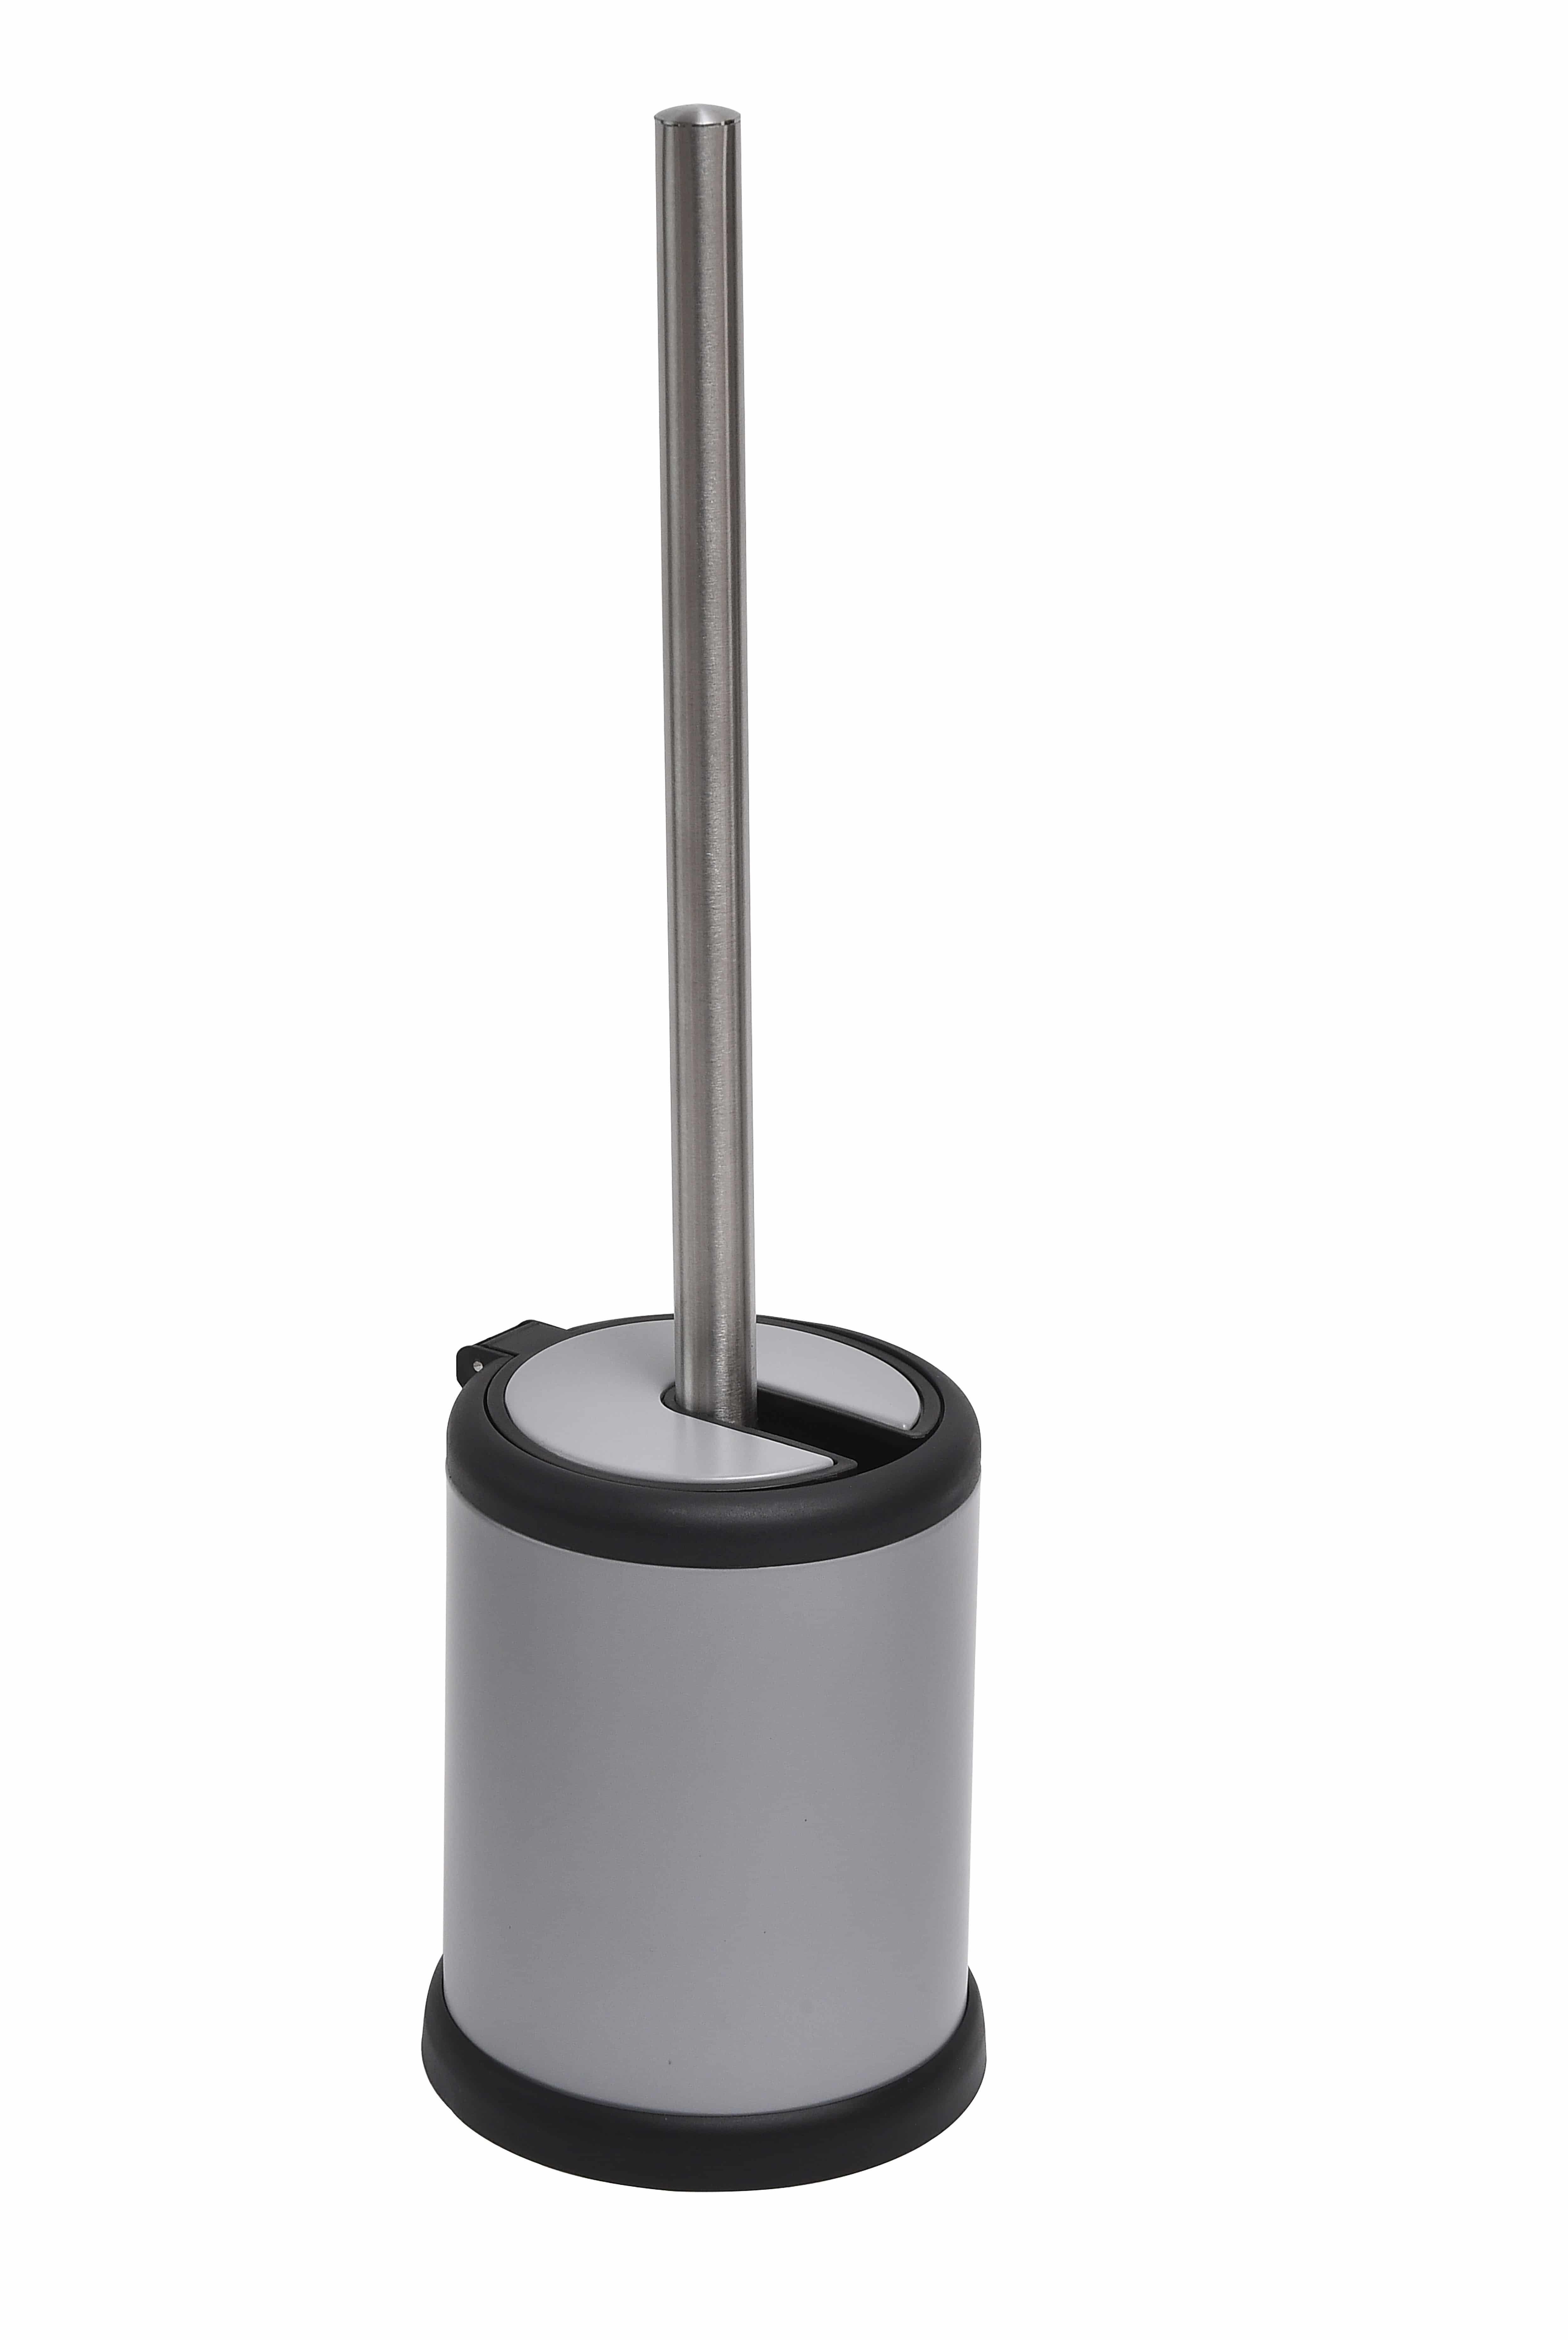 4goodz toiletborstel met klep - 11,5x39 cm - Mat Grijs